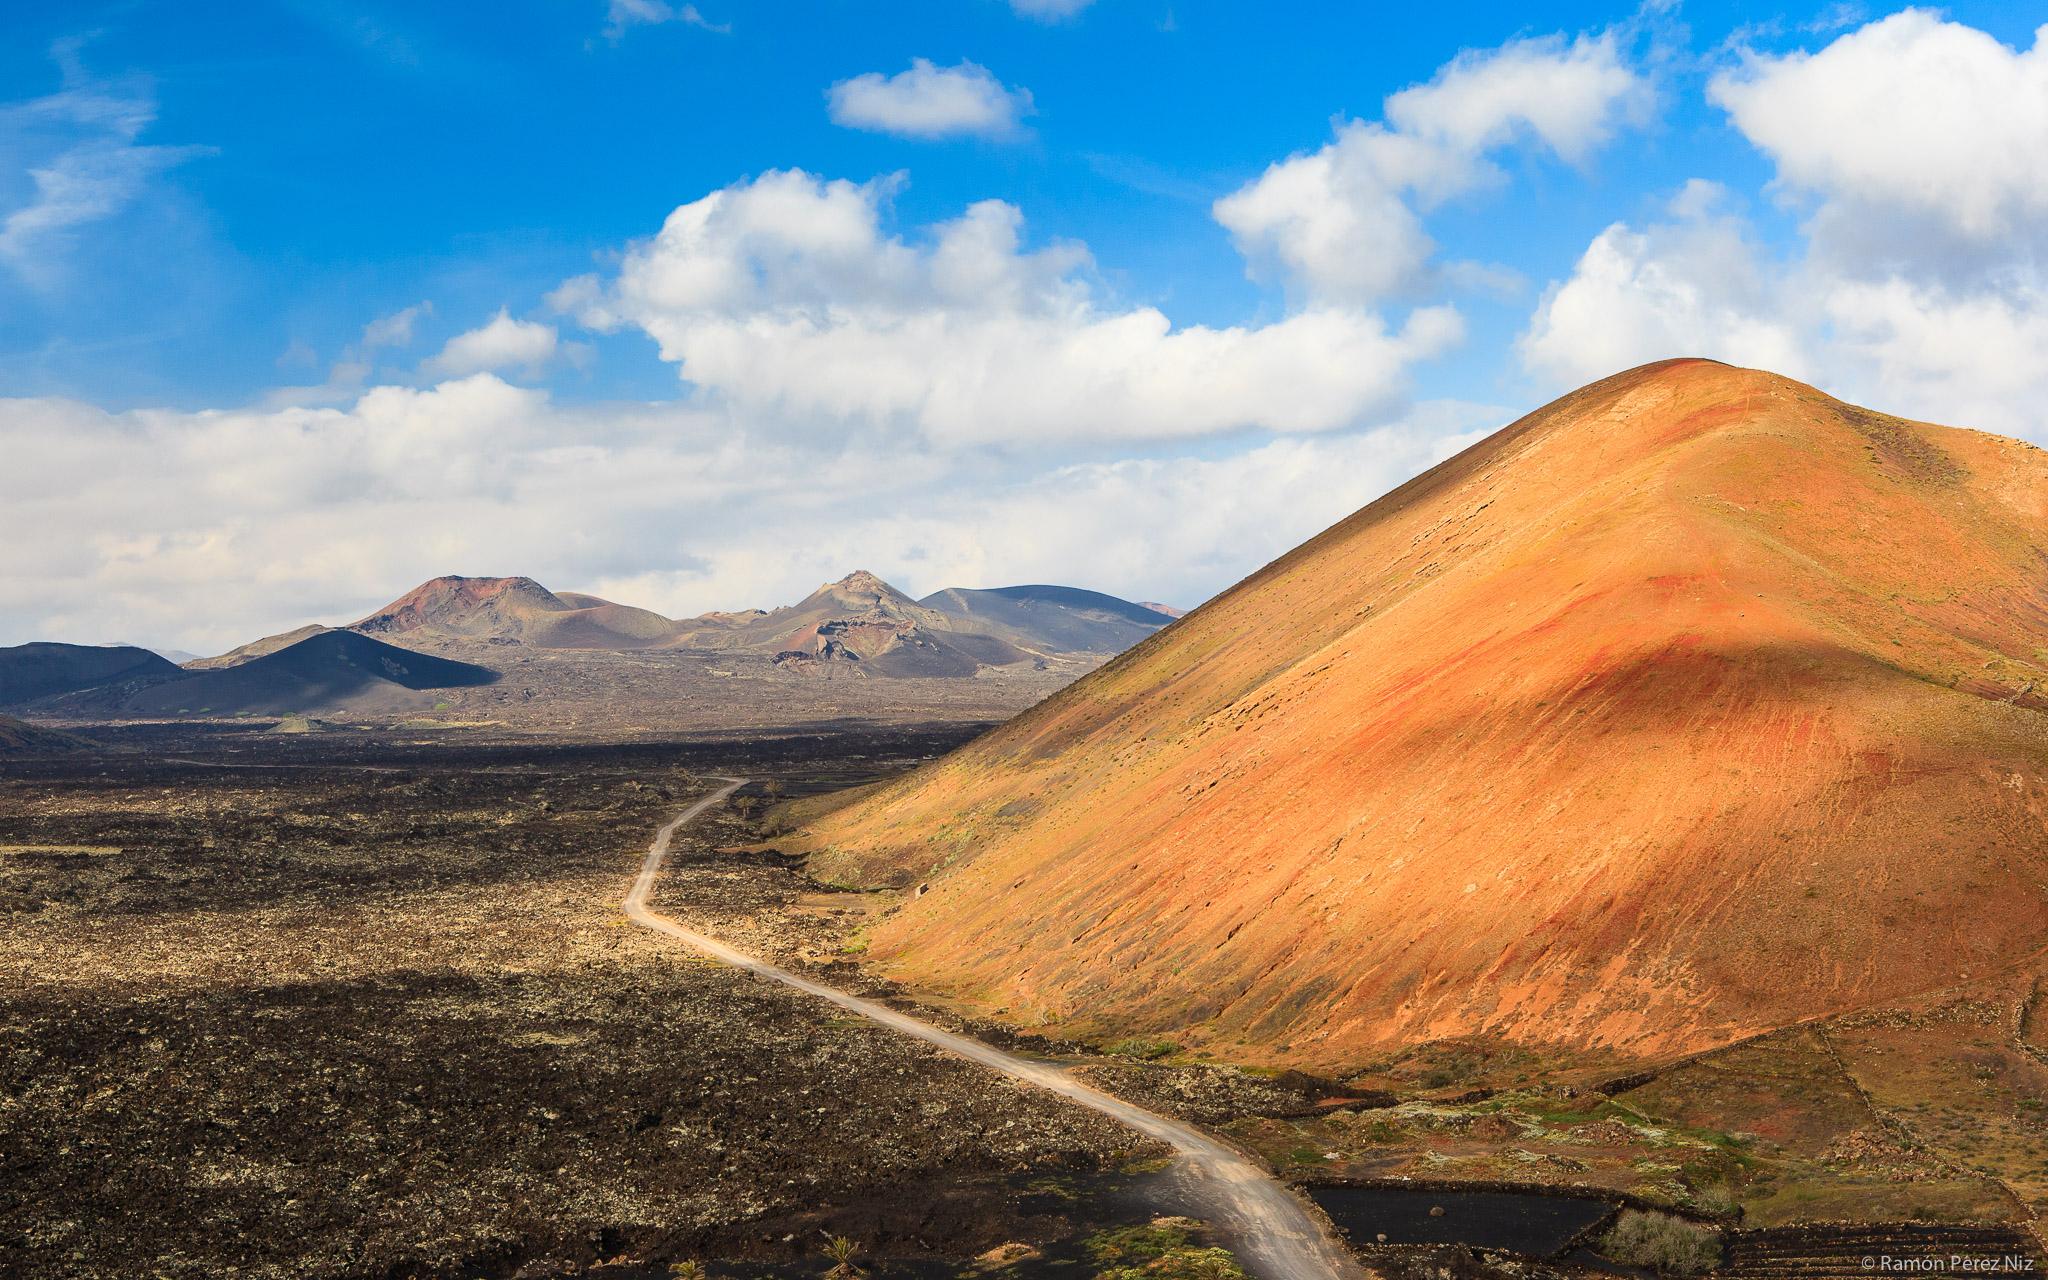 Foto de Ramón Pérez Niz. Volcanes de Lanzarote